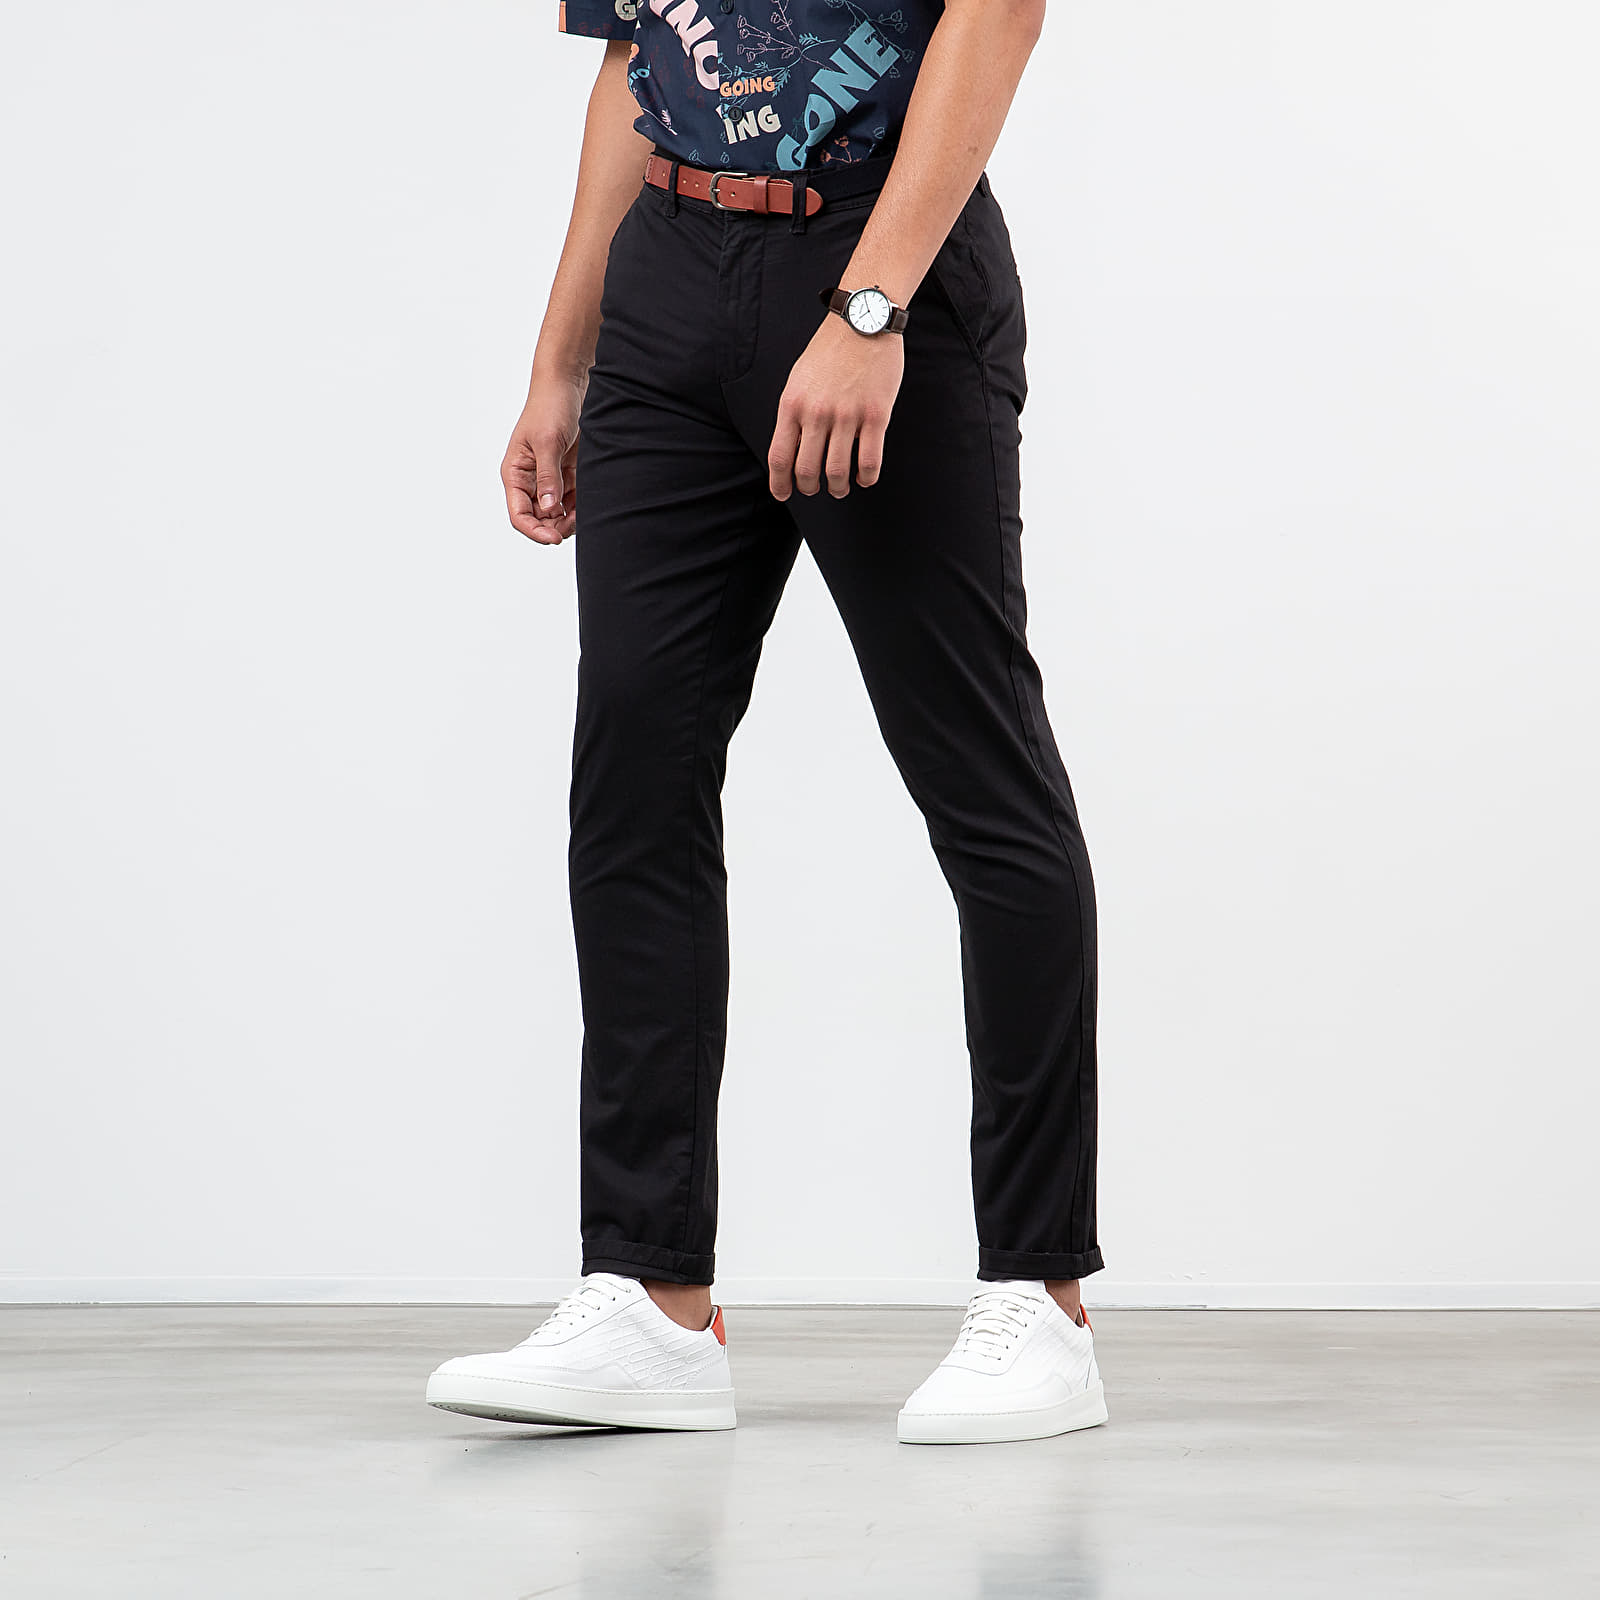 Pants and jeans SELECTED Slim-Yard Pants Black